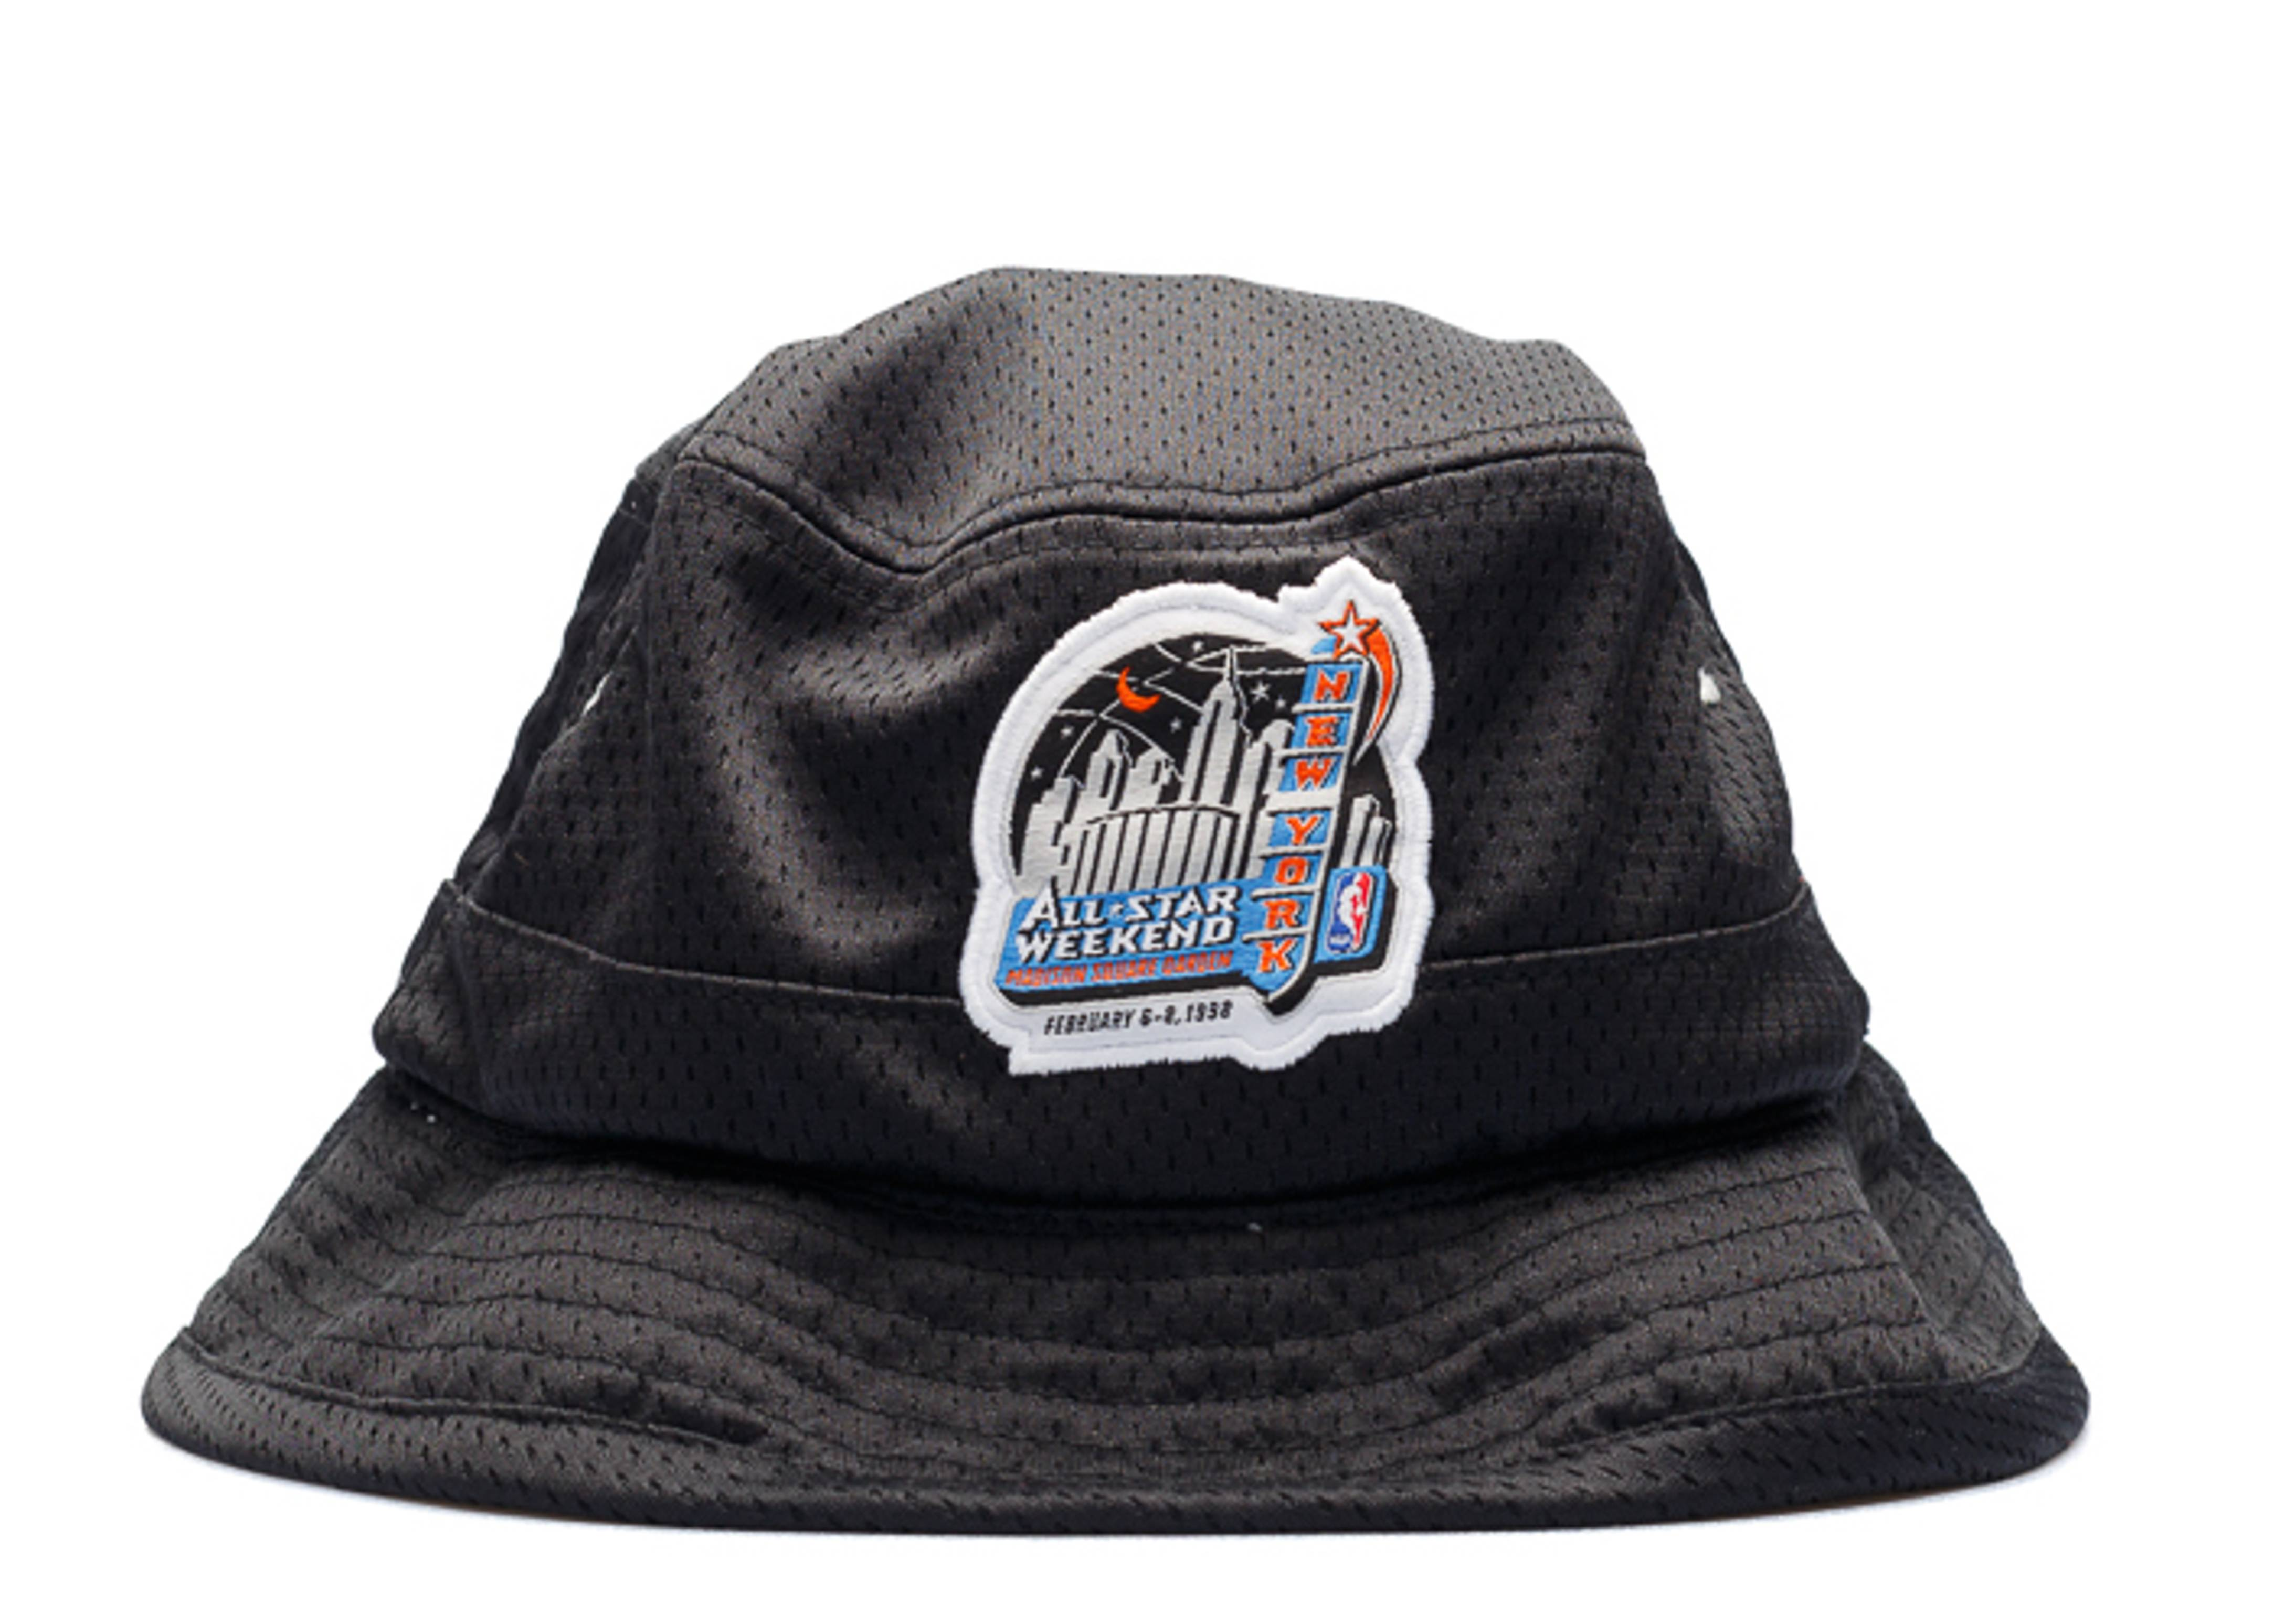 1998 all-star game reverisble mesh bucket hat